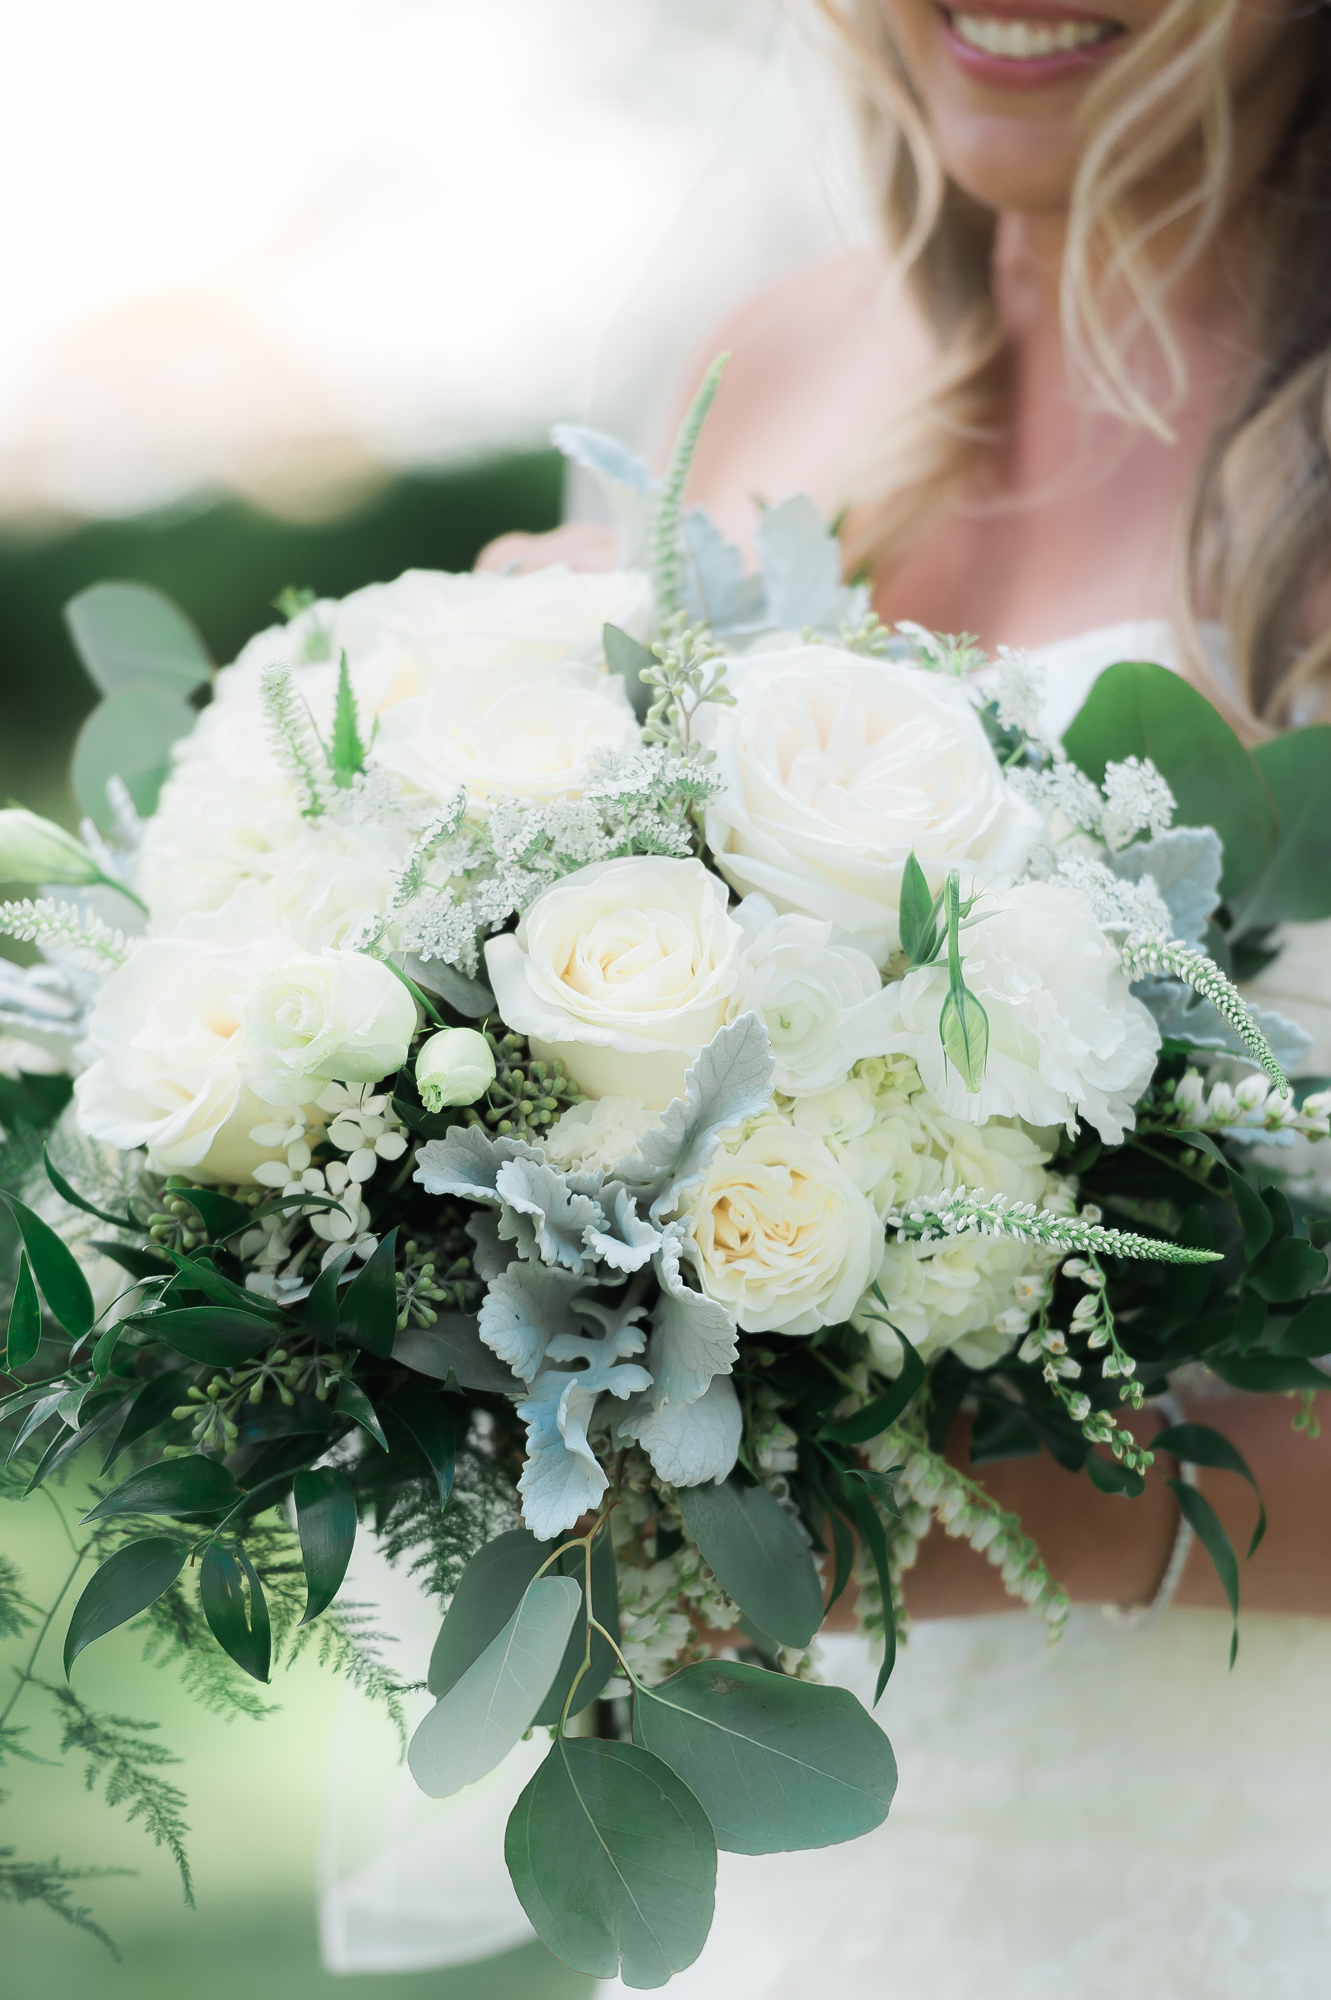 Kristine+Mike_wedding_Blog_spp-102.jpg